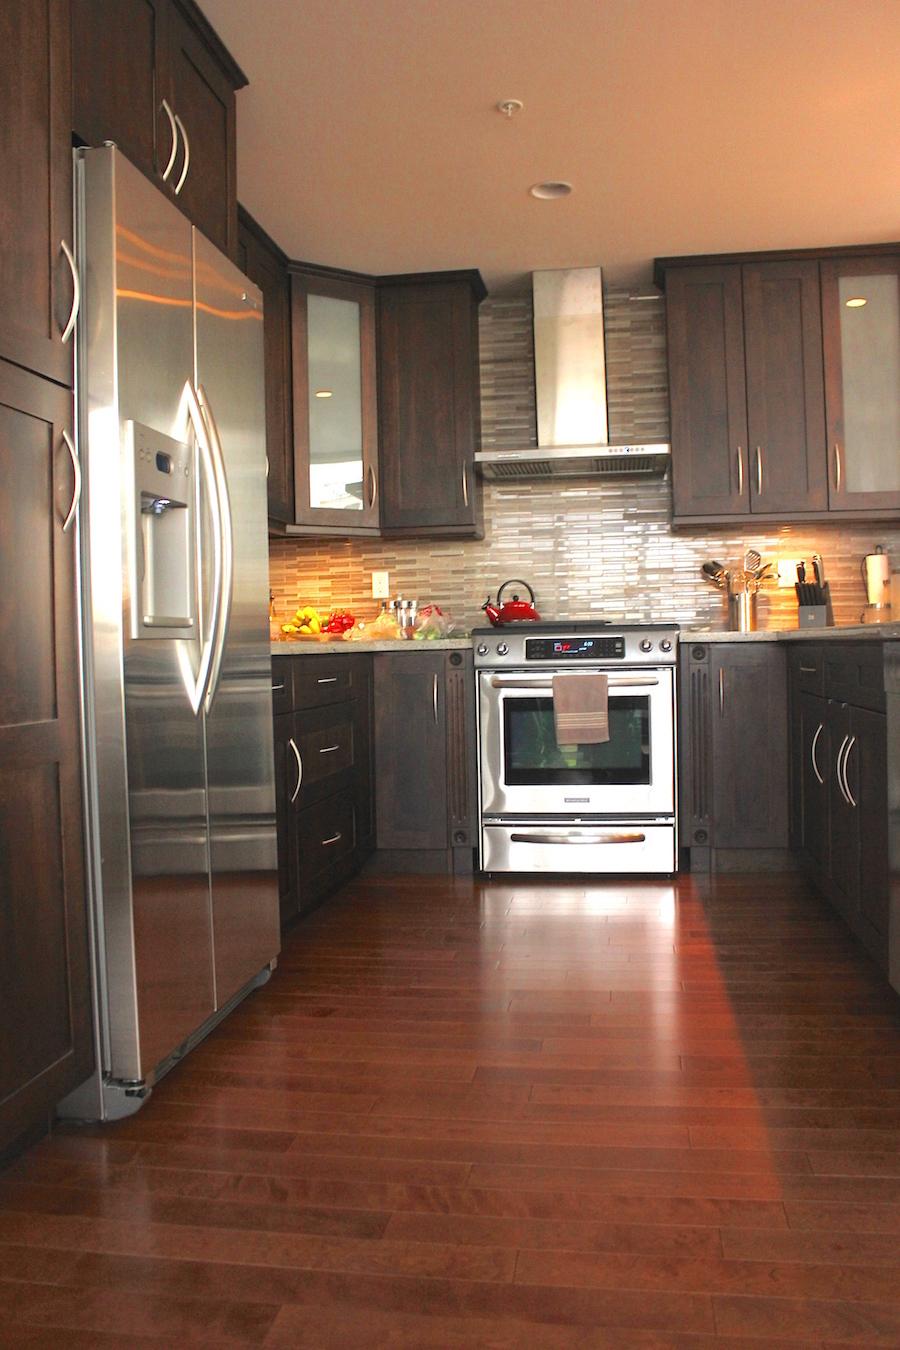 Condo Kitchen with hardwood floors